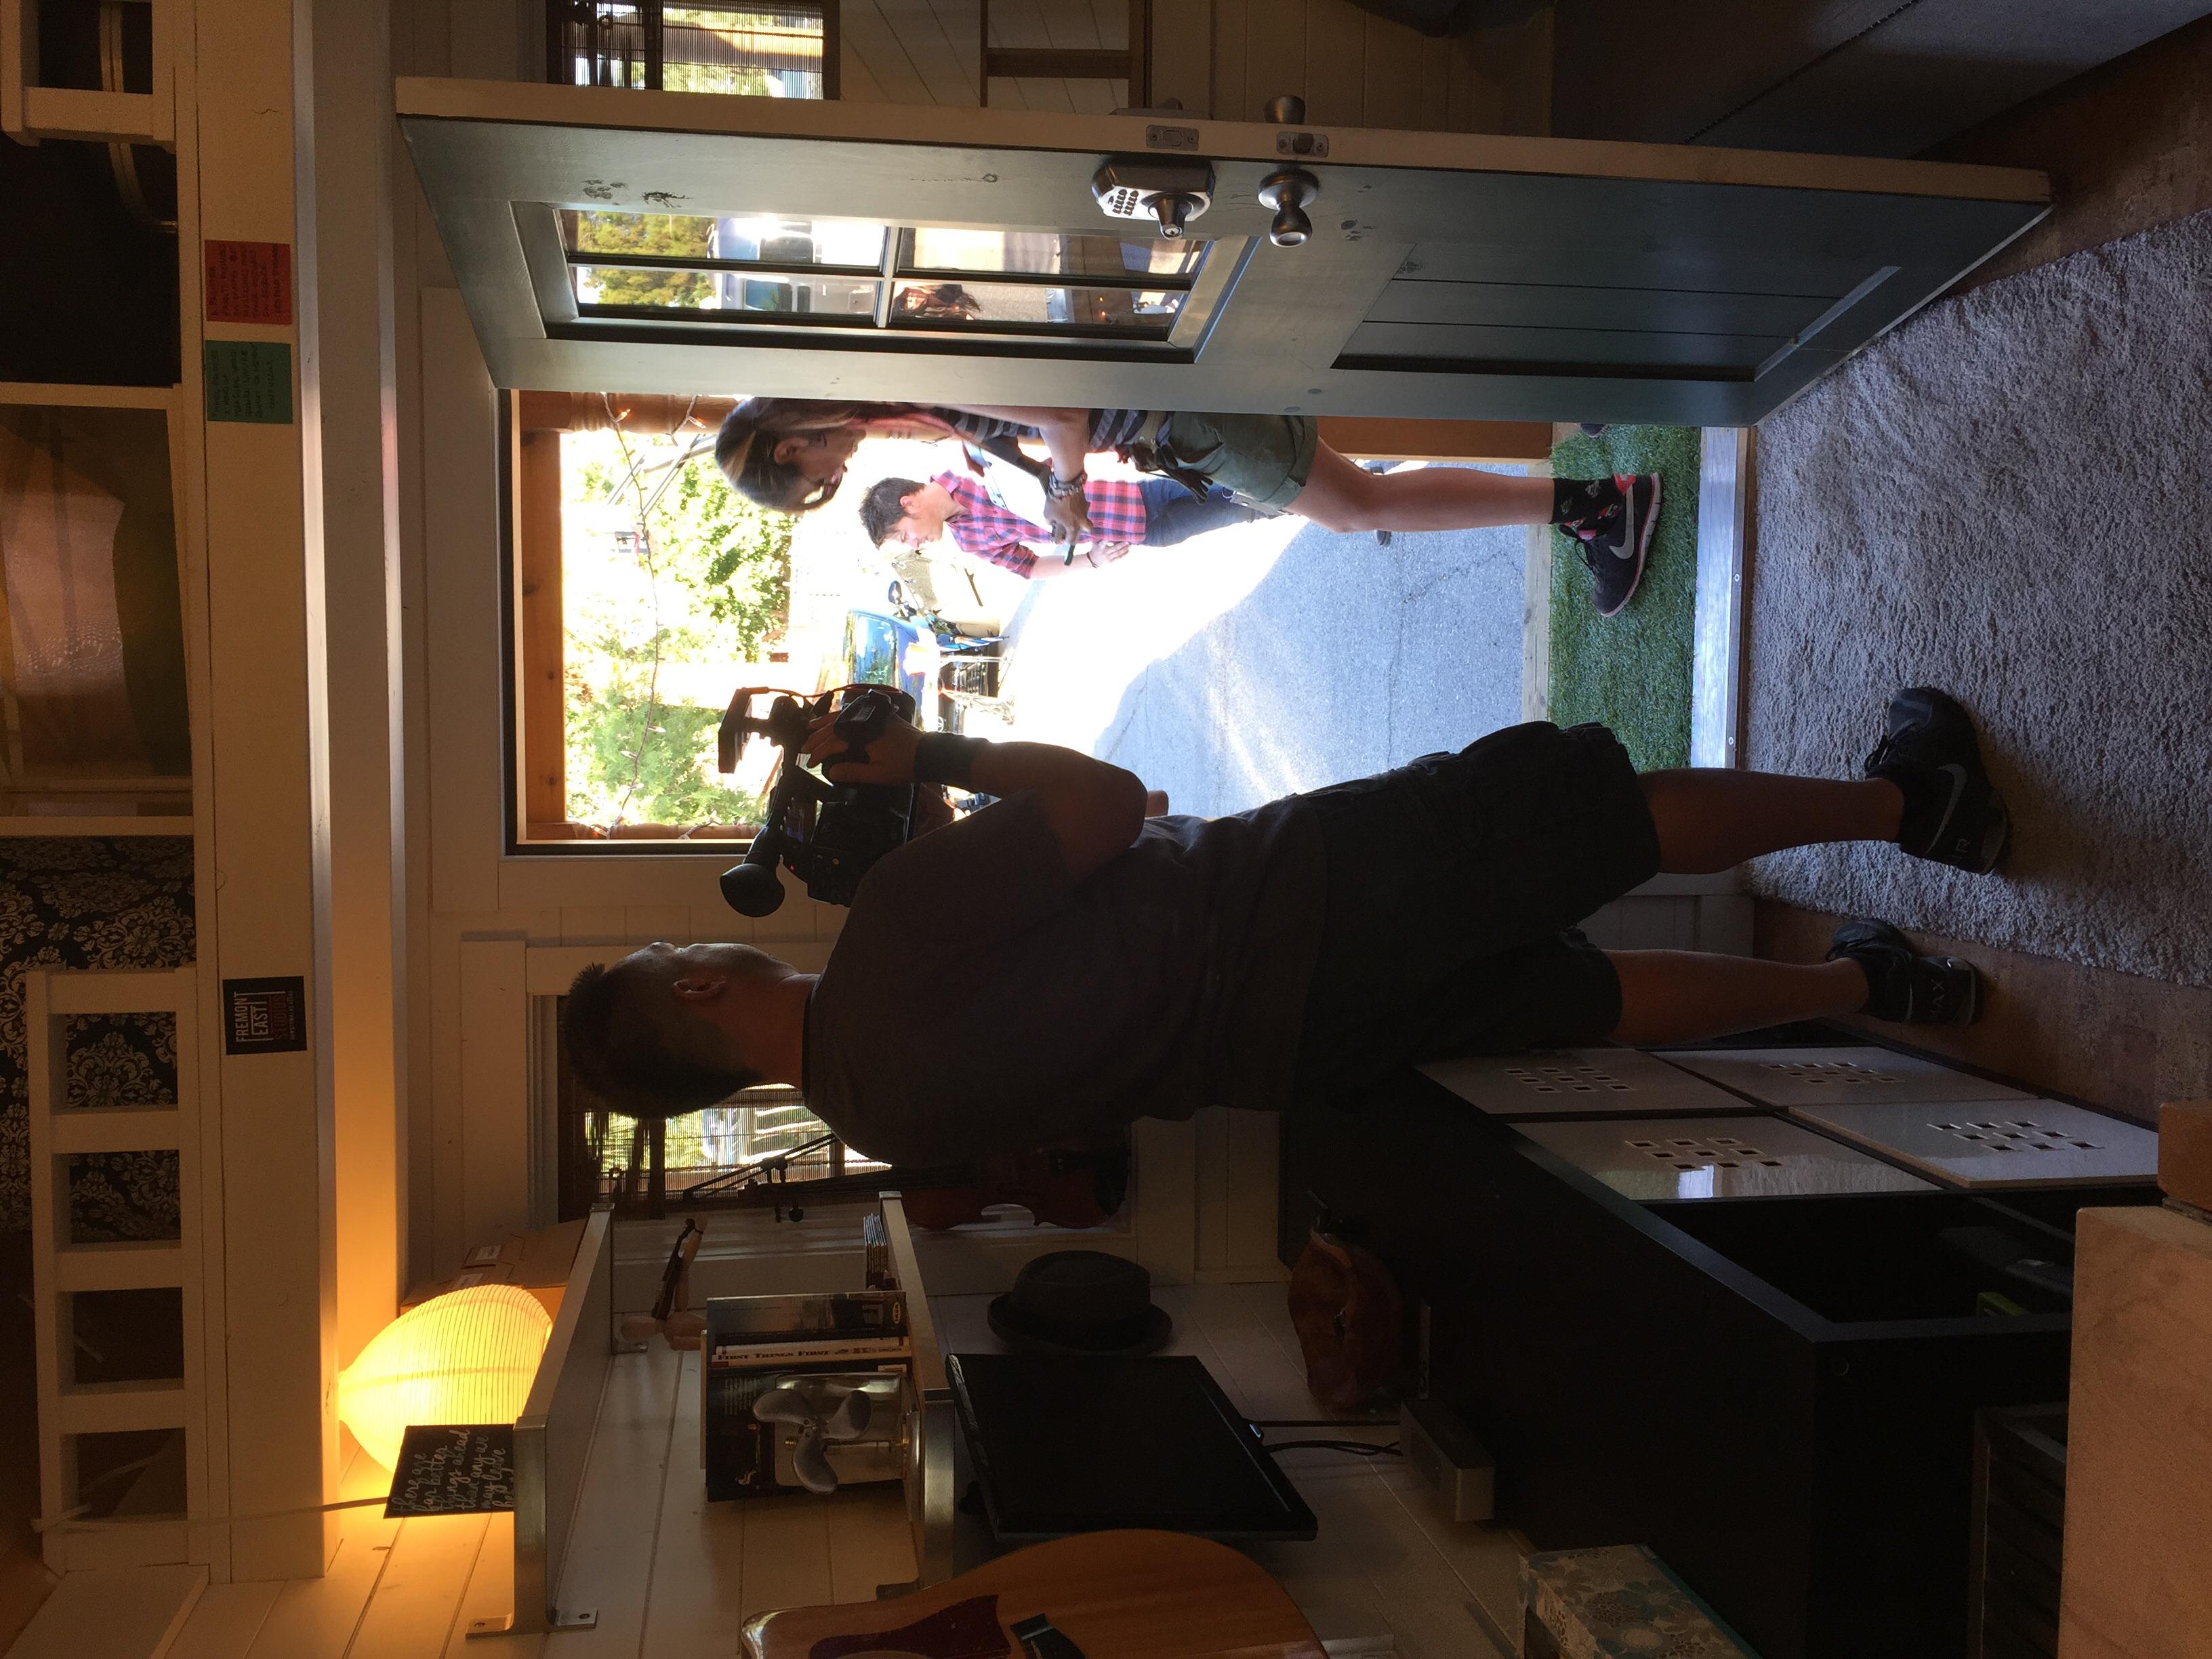 Camera crew getting ready